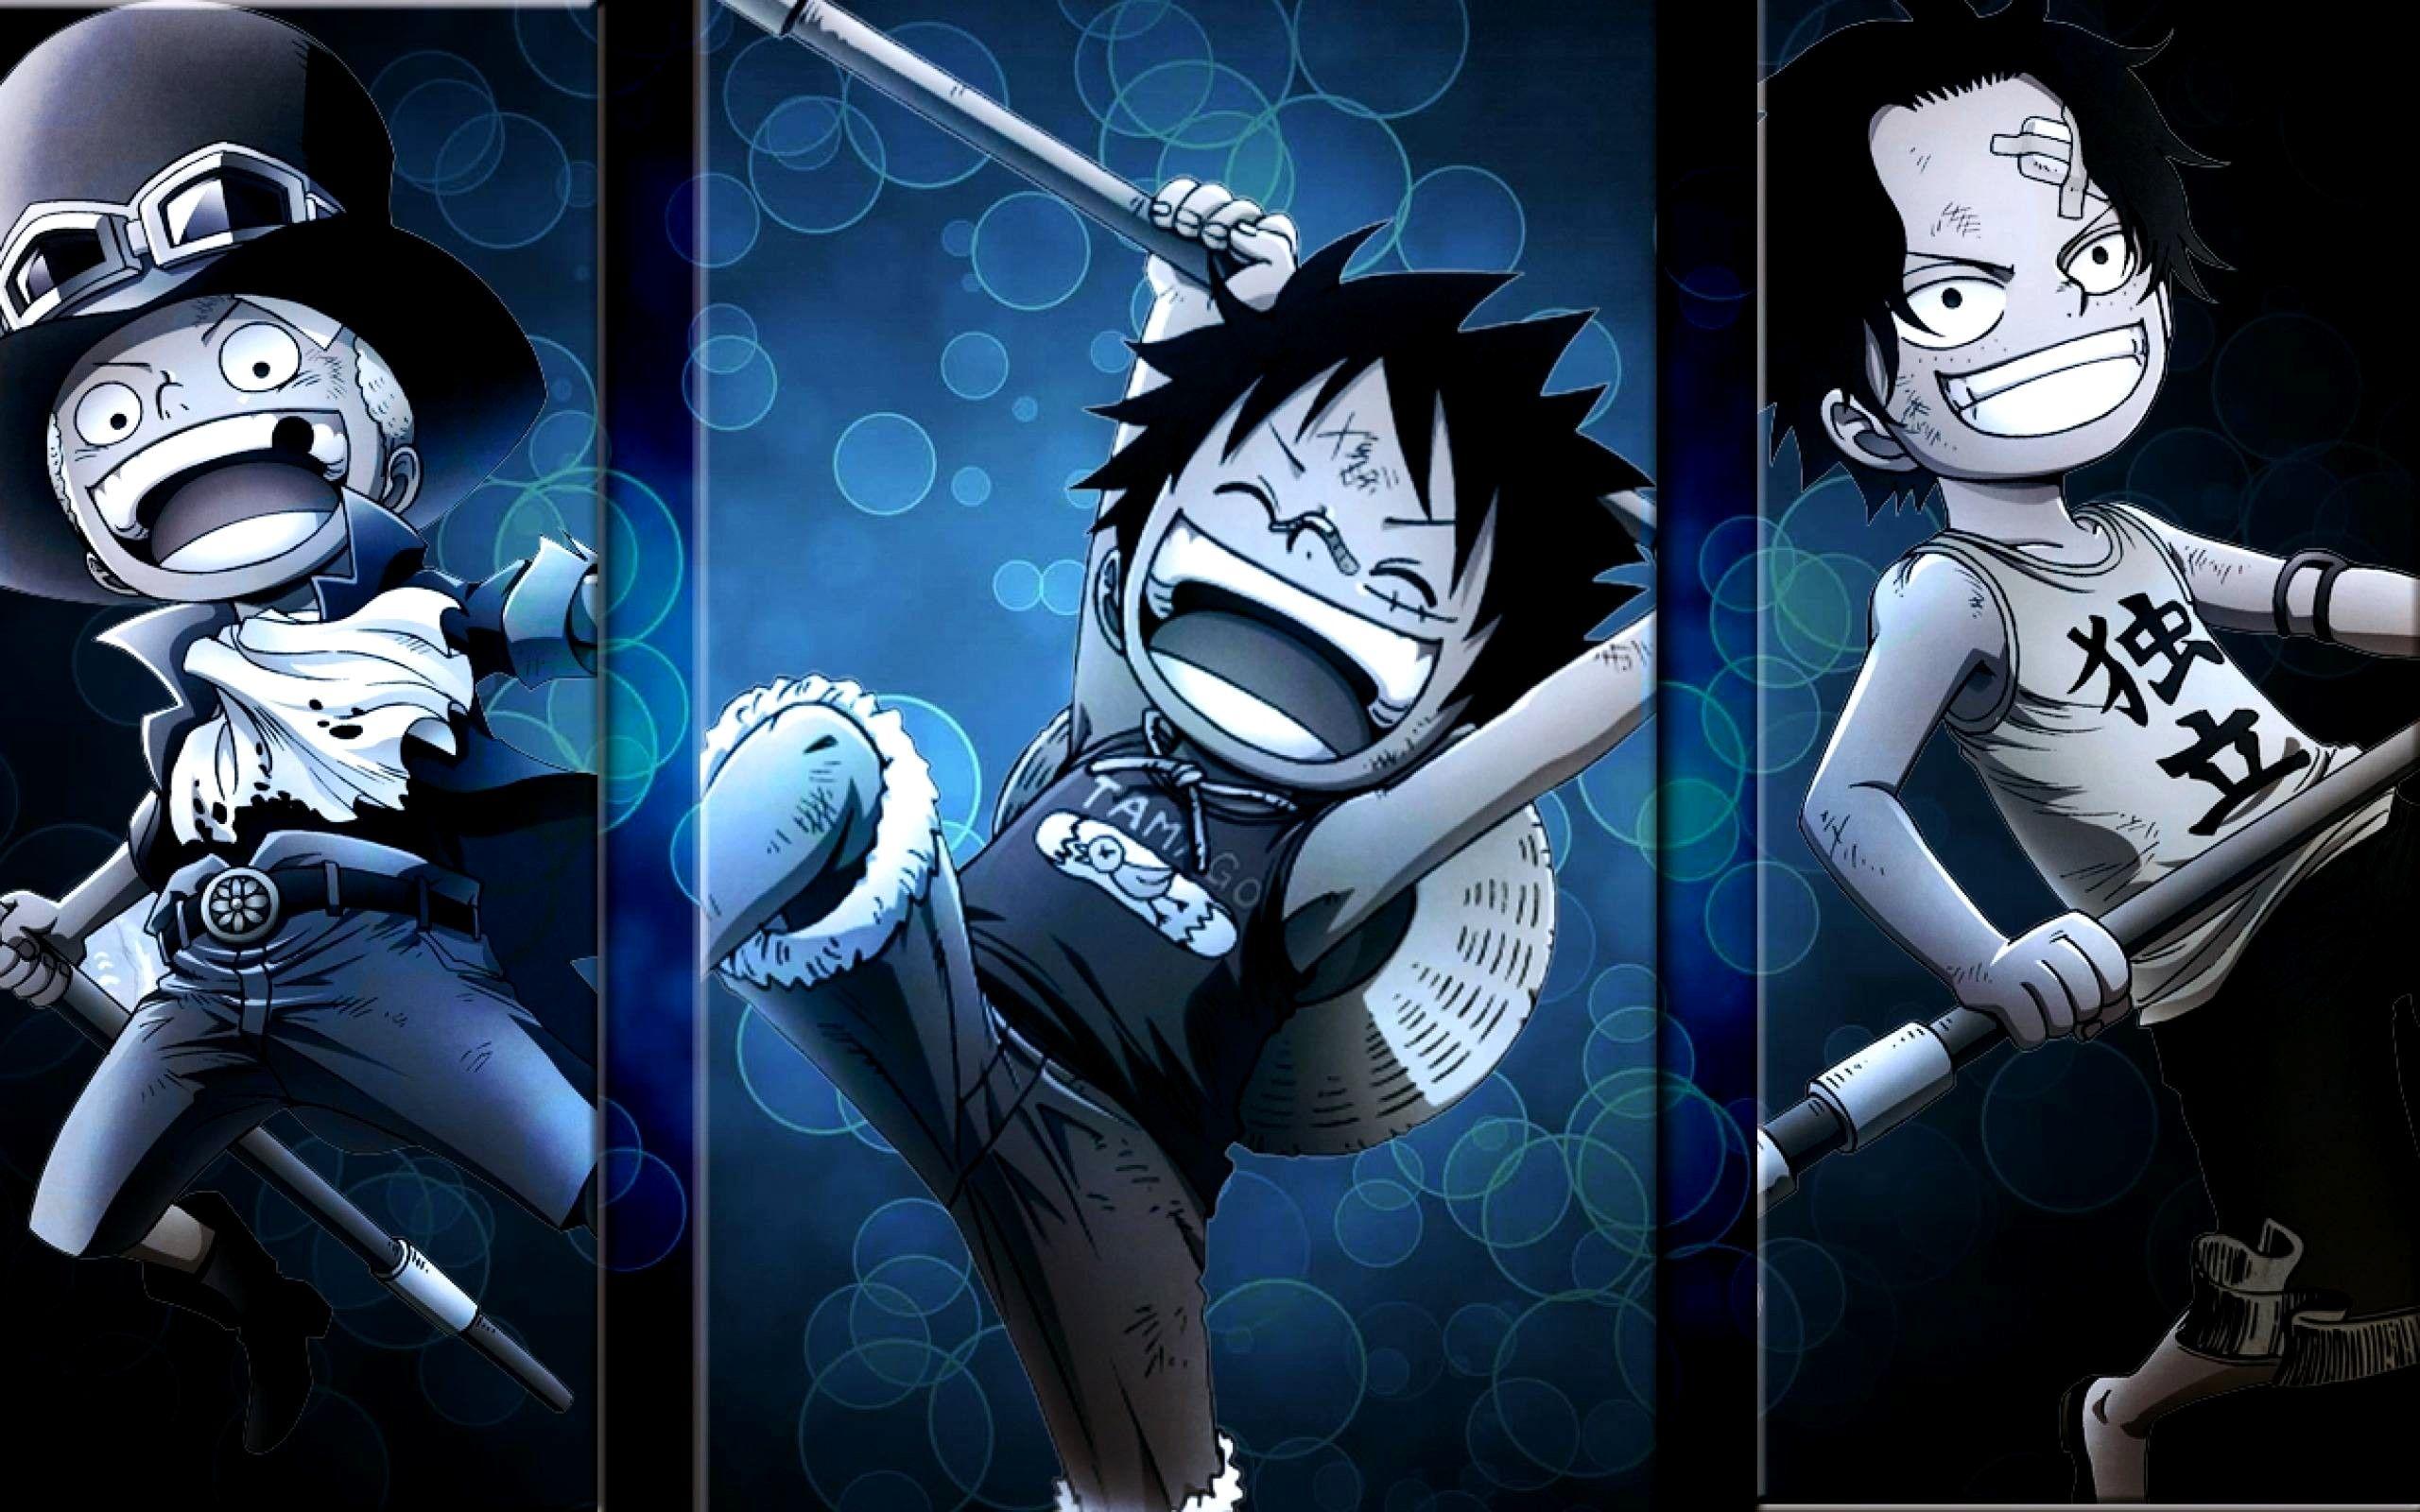 Wallpaper 4k Pc One Piece Trick Di 2020 Seni Anime Gambar Gambar Anime